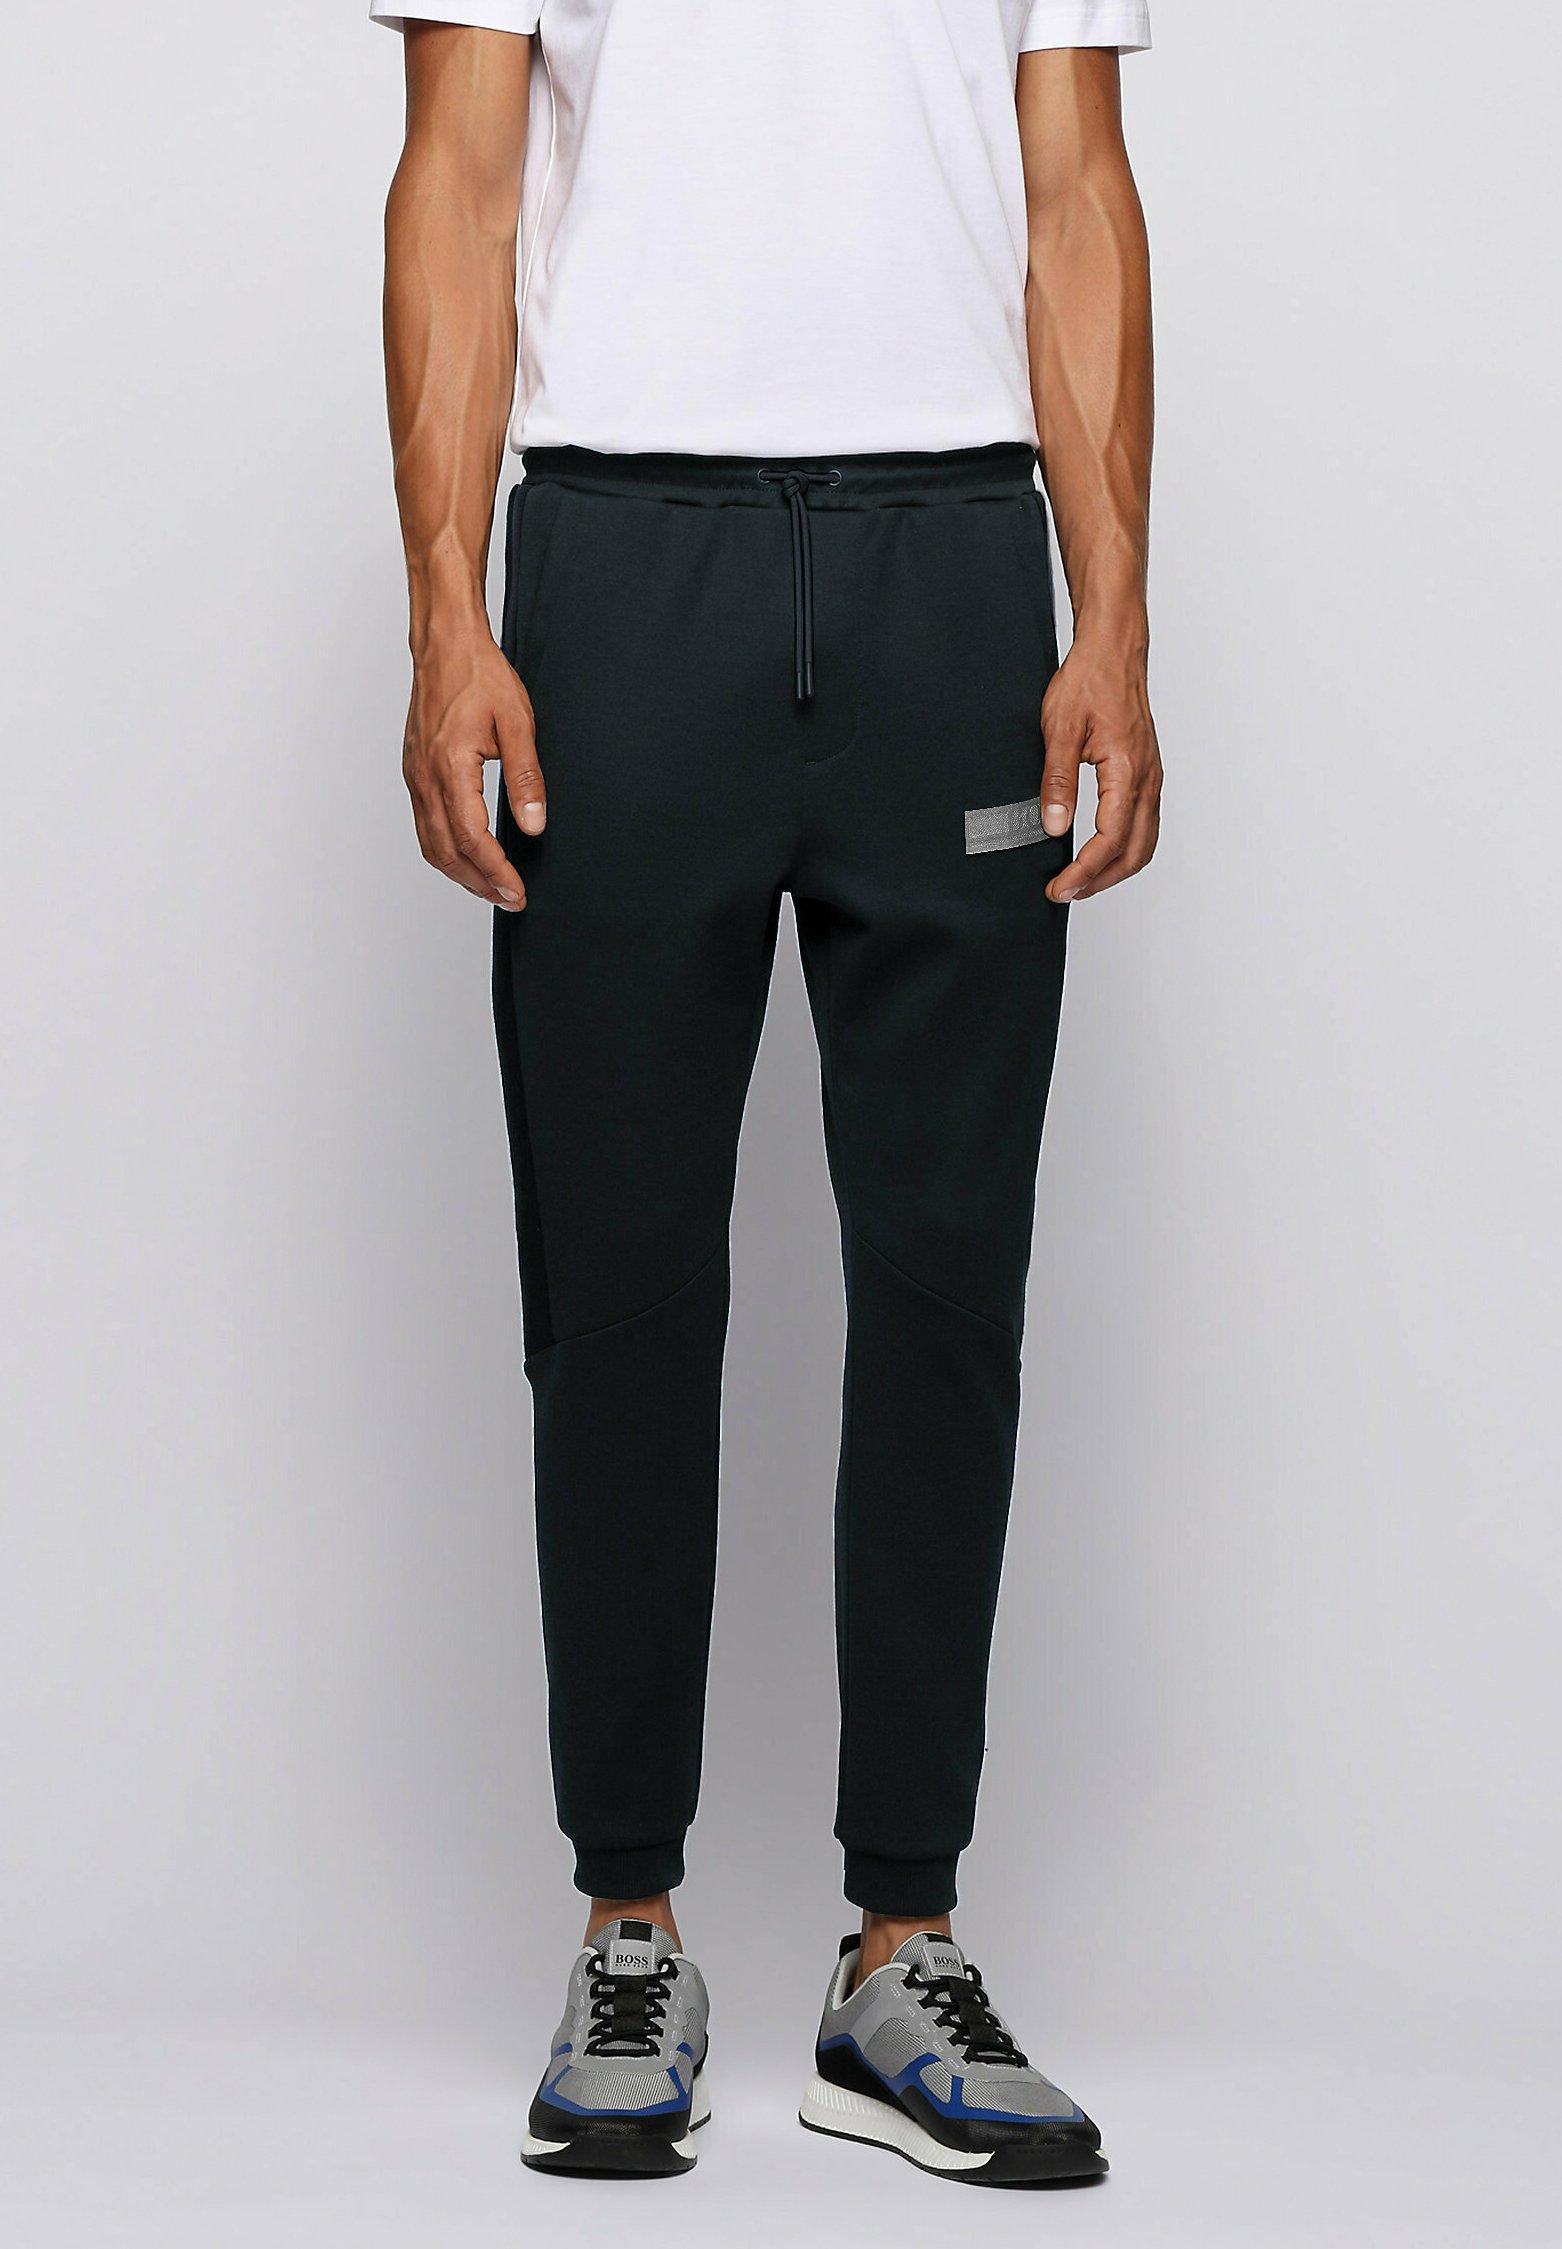 Homme HADIKO BATCH Z - Pantalon de survêtement